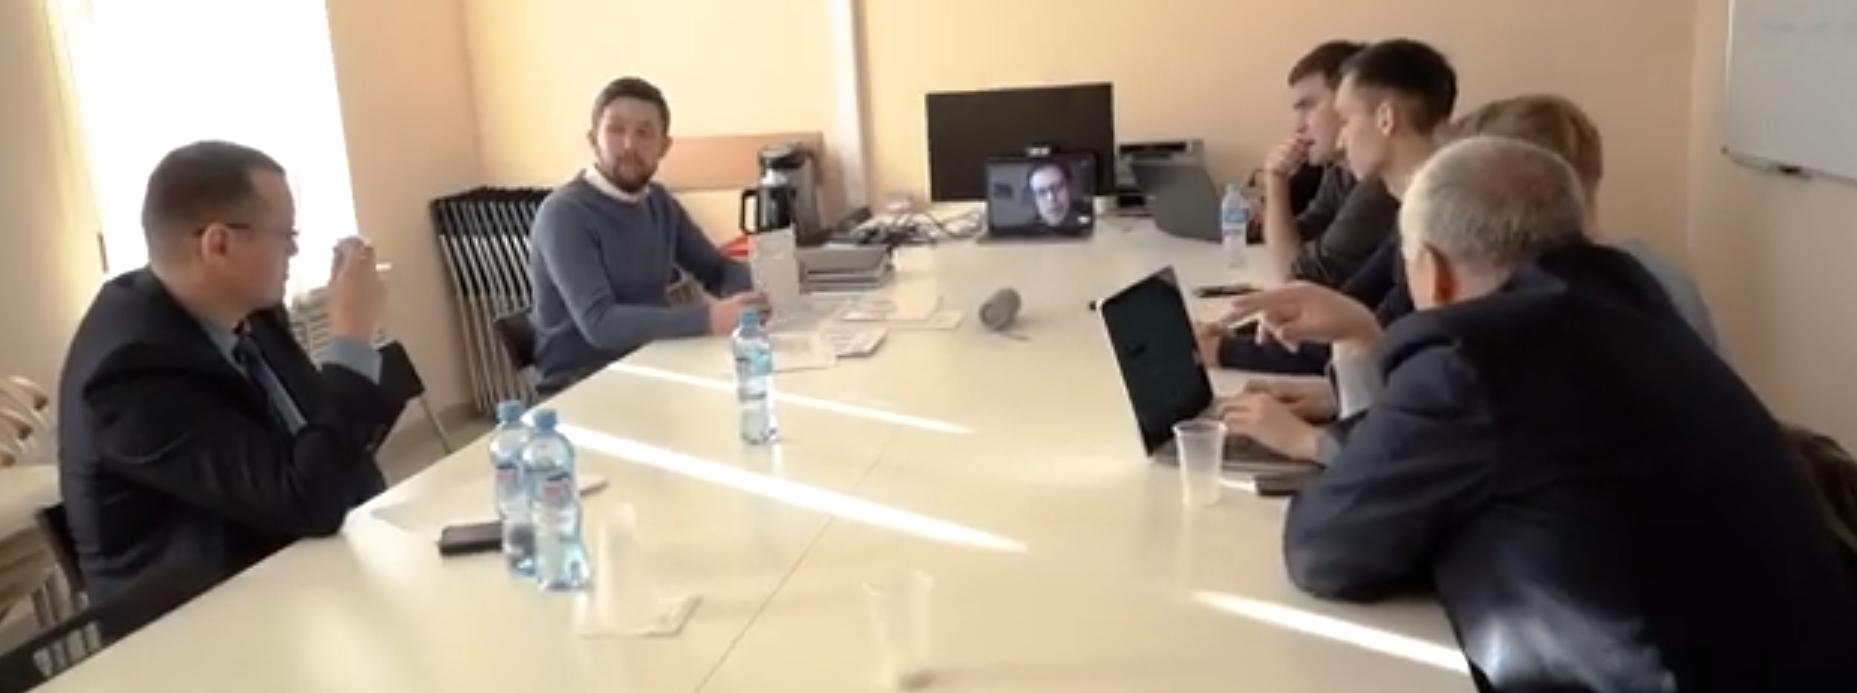 Технологизация башкирского языка